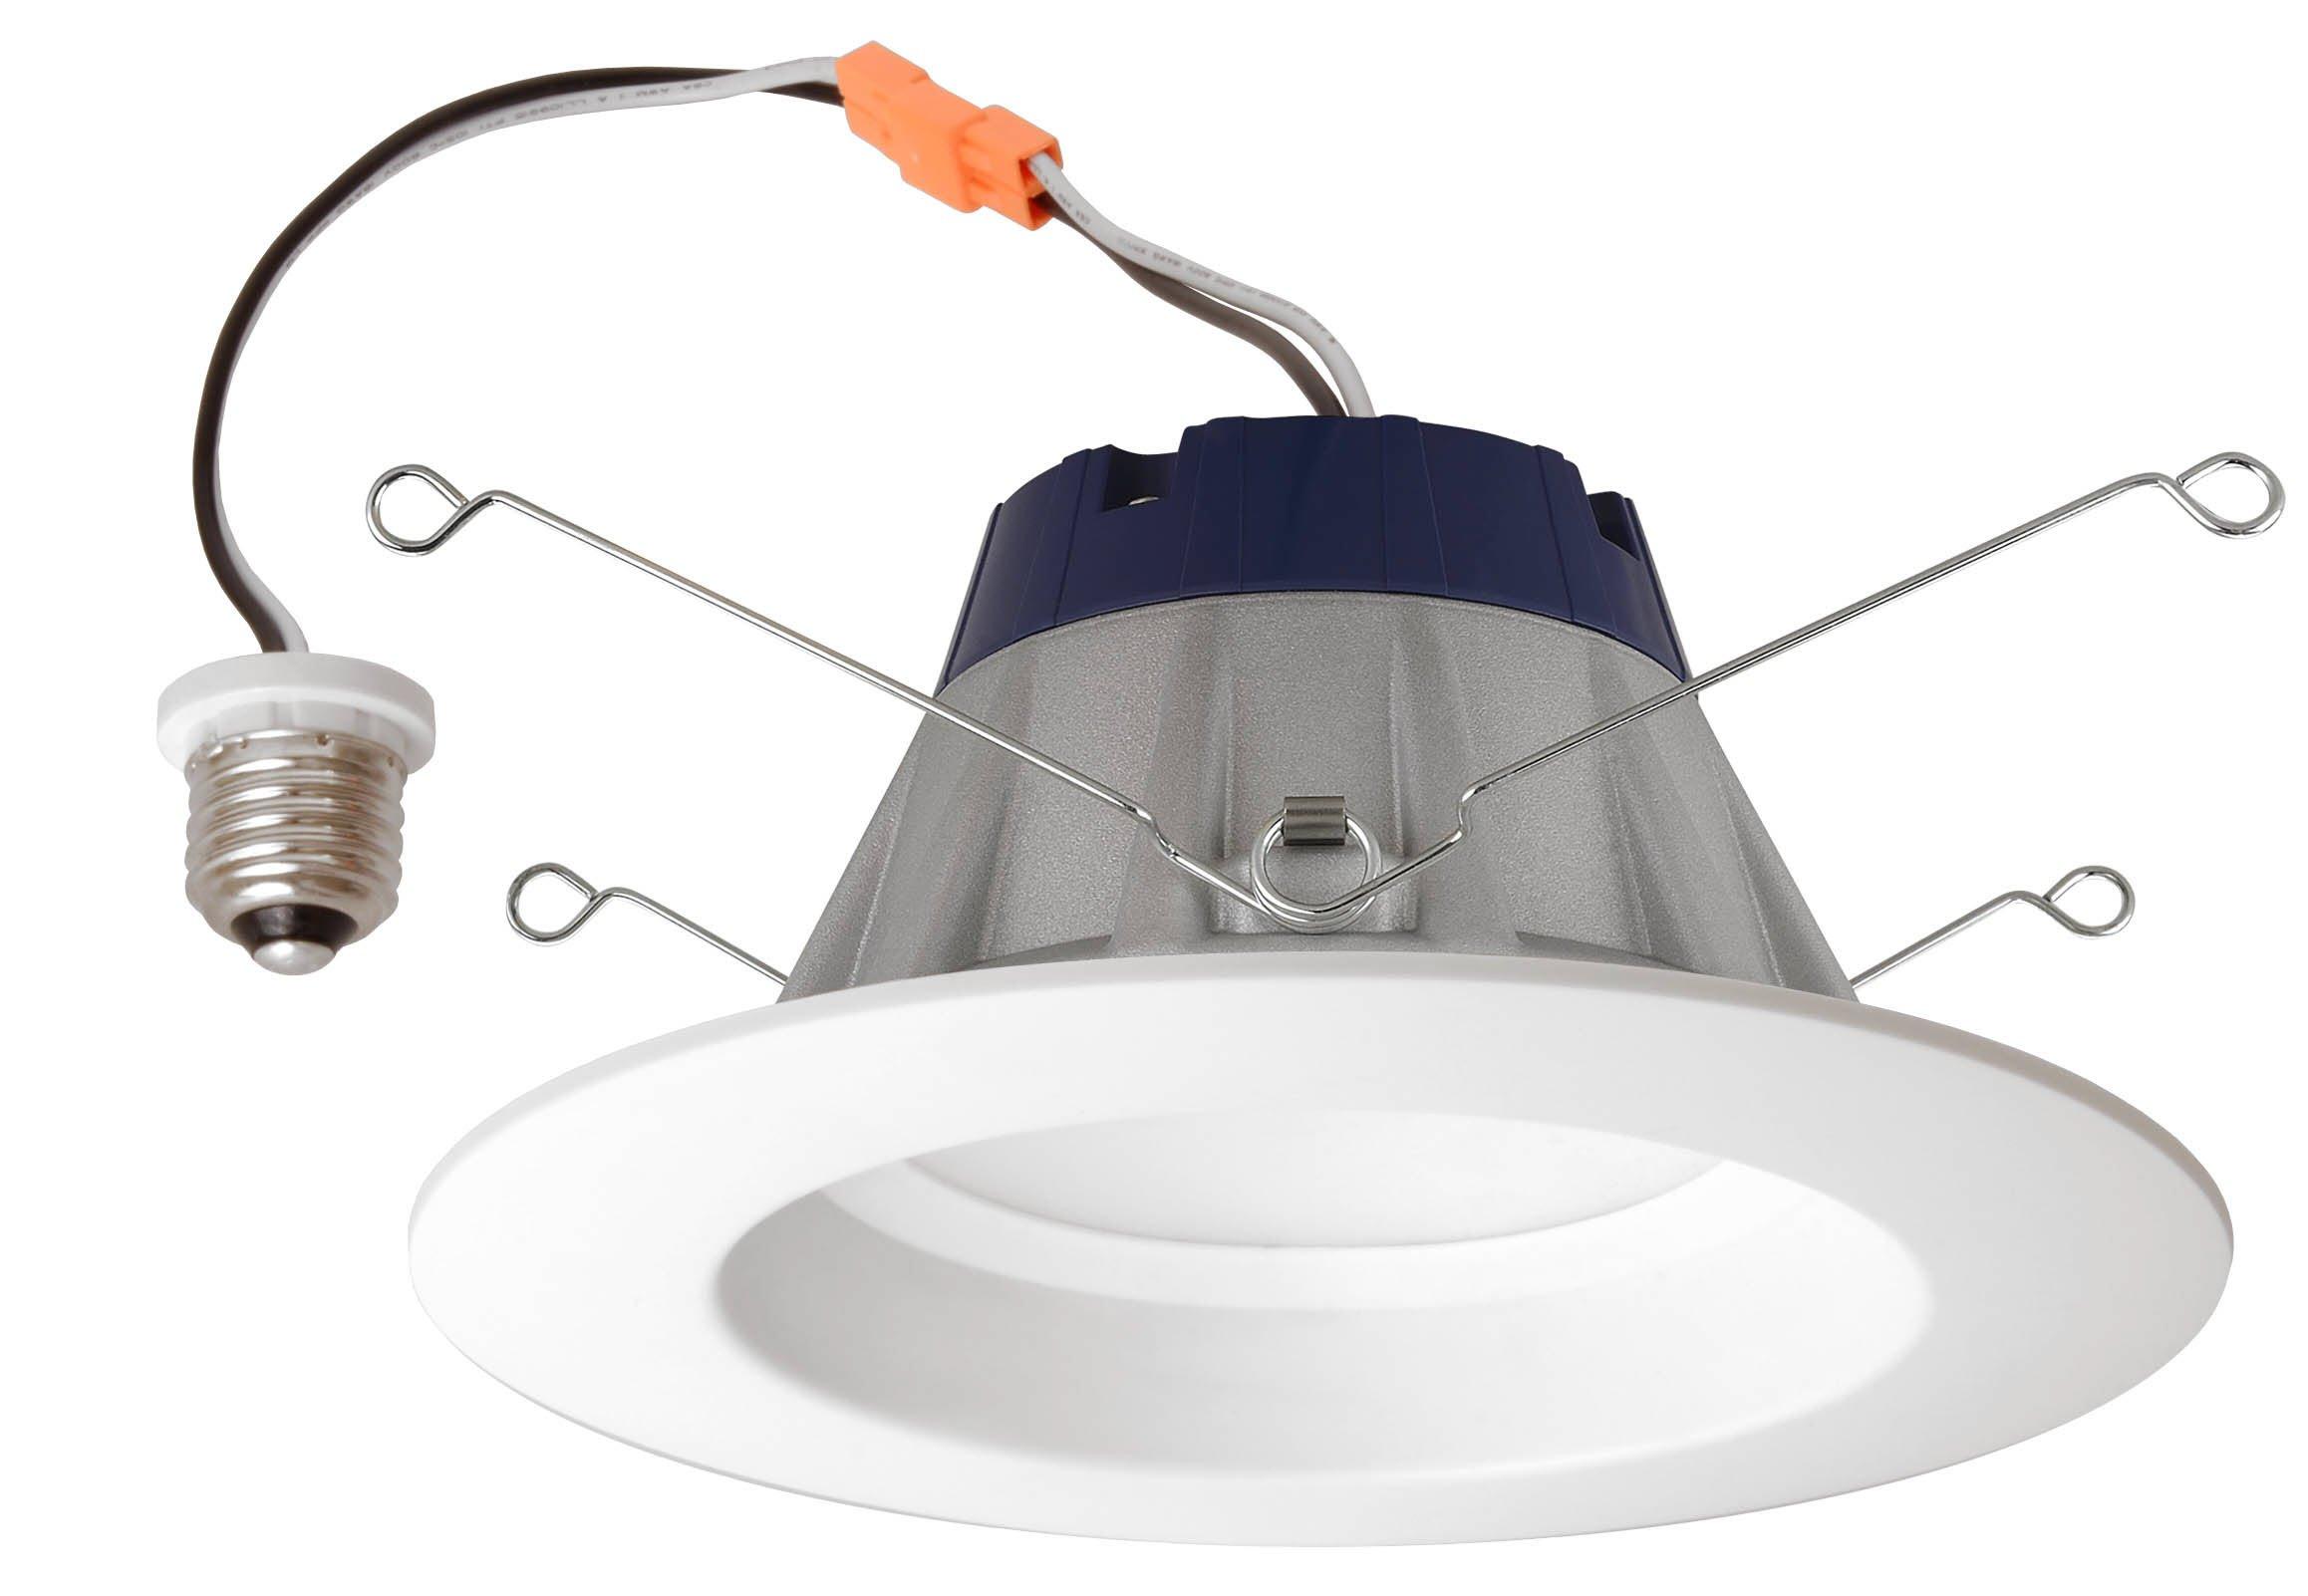 Sylvania 74290 - LEDRT56700927FL80 LED Recessed Can Retrofit Kit with 5 6 Inch Recessed Housing